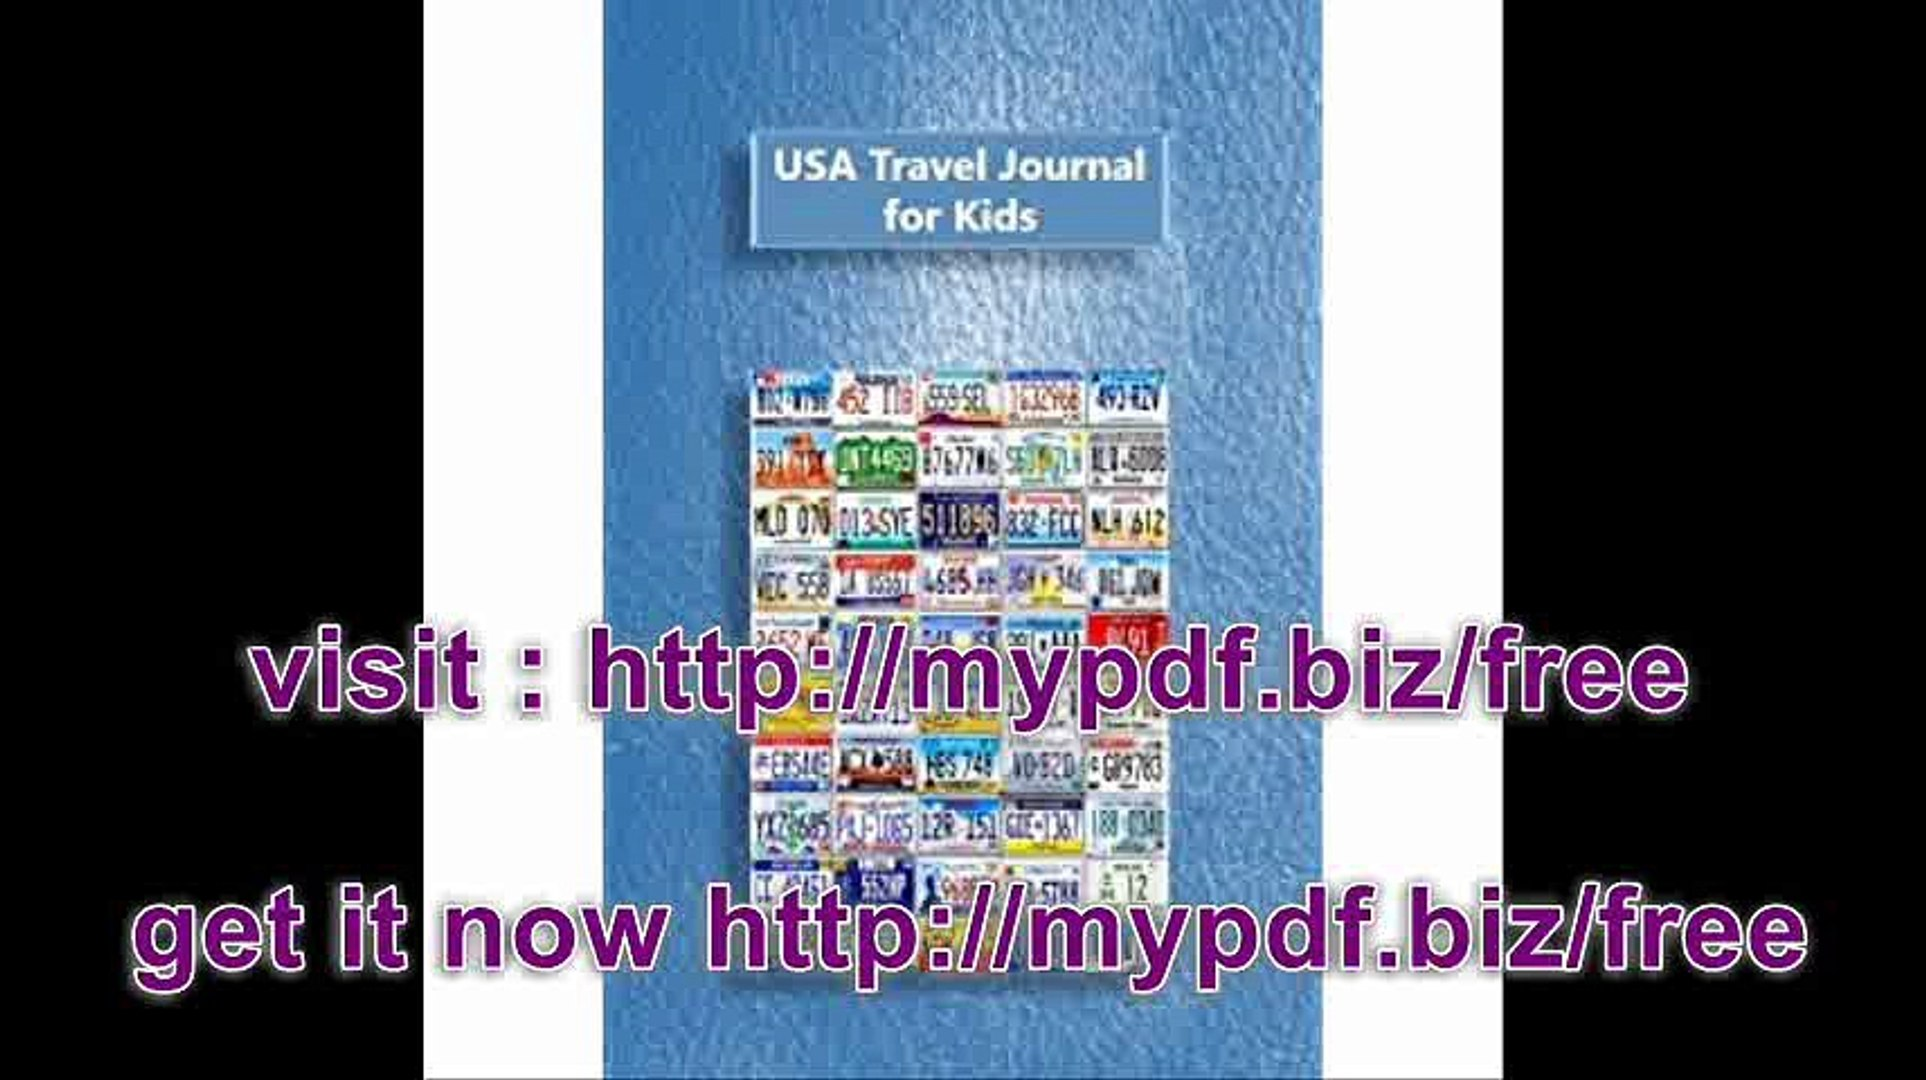 USA Travel Journal for Kids